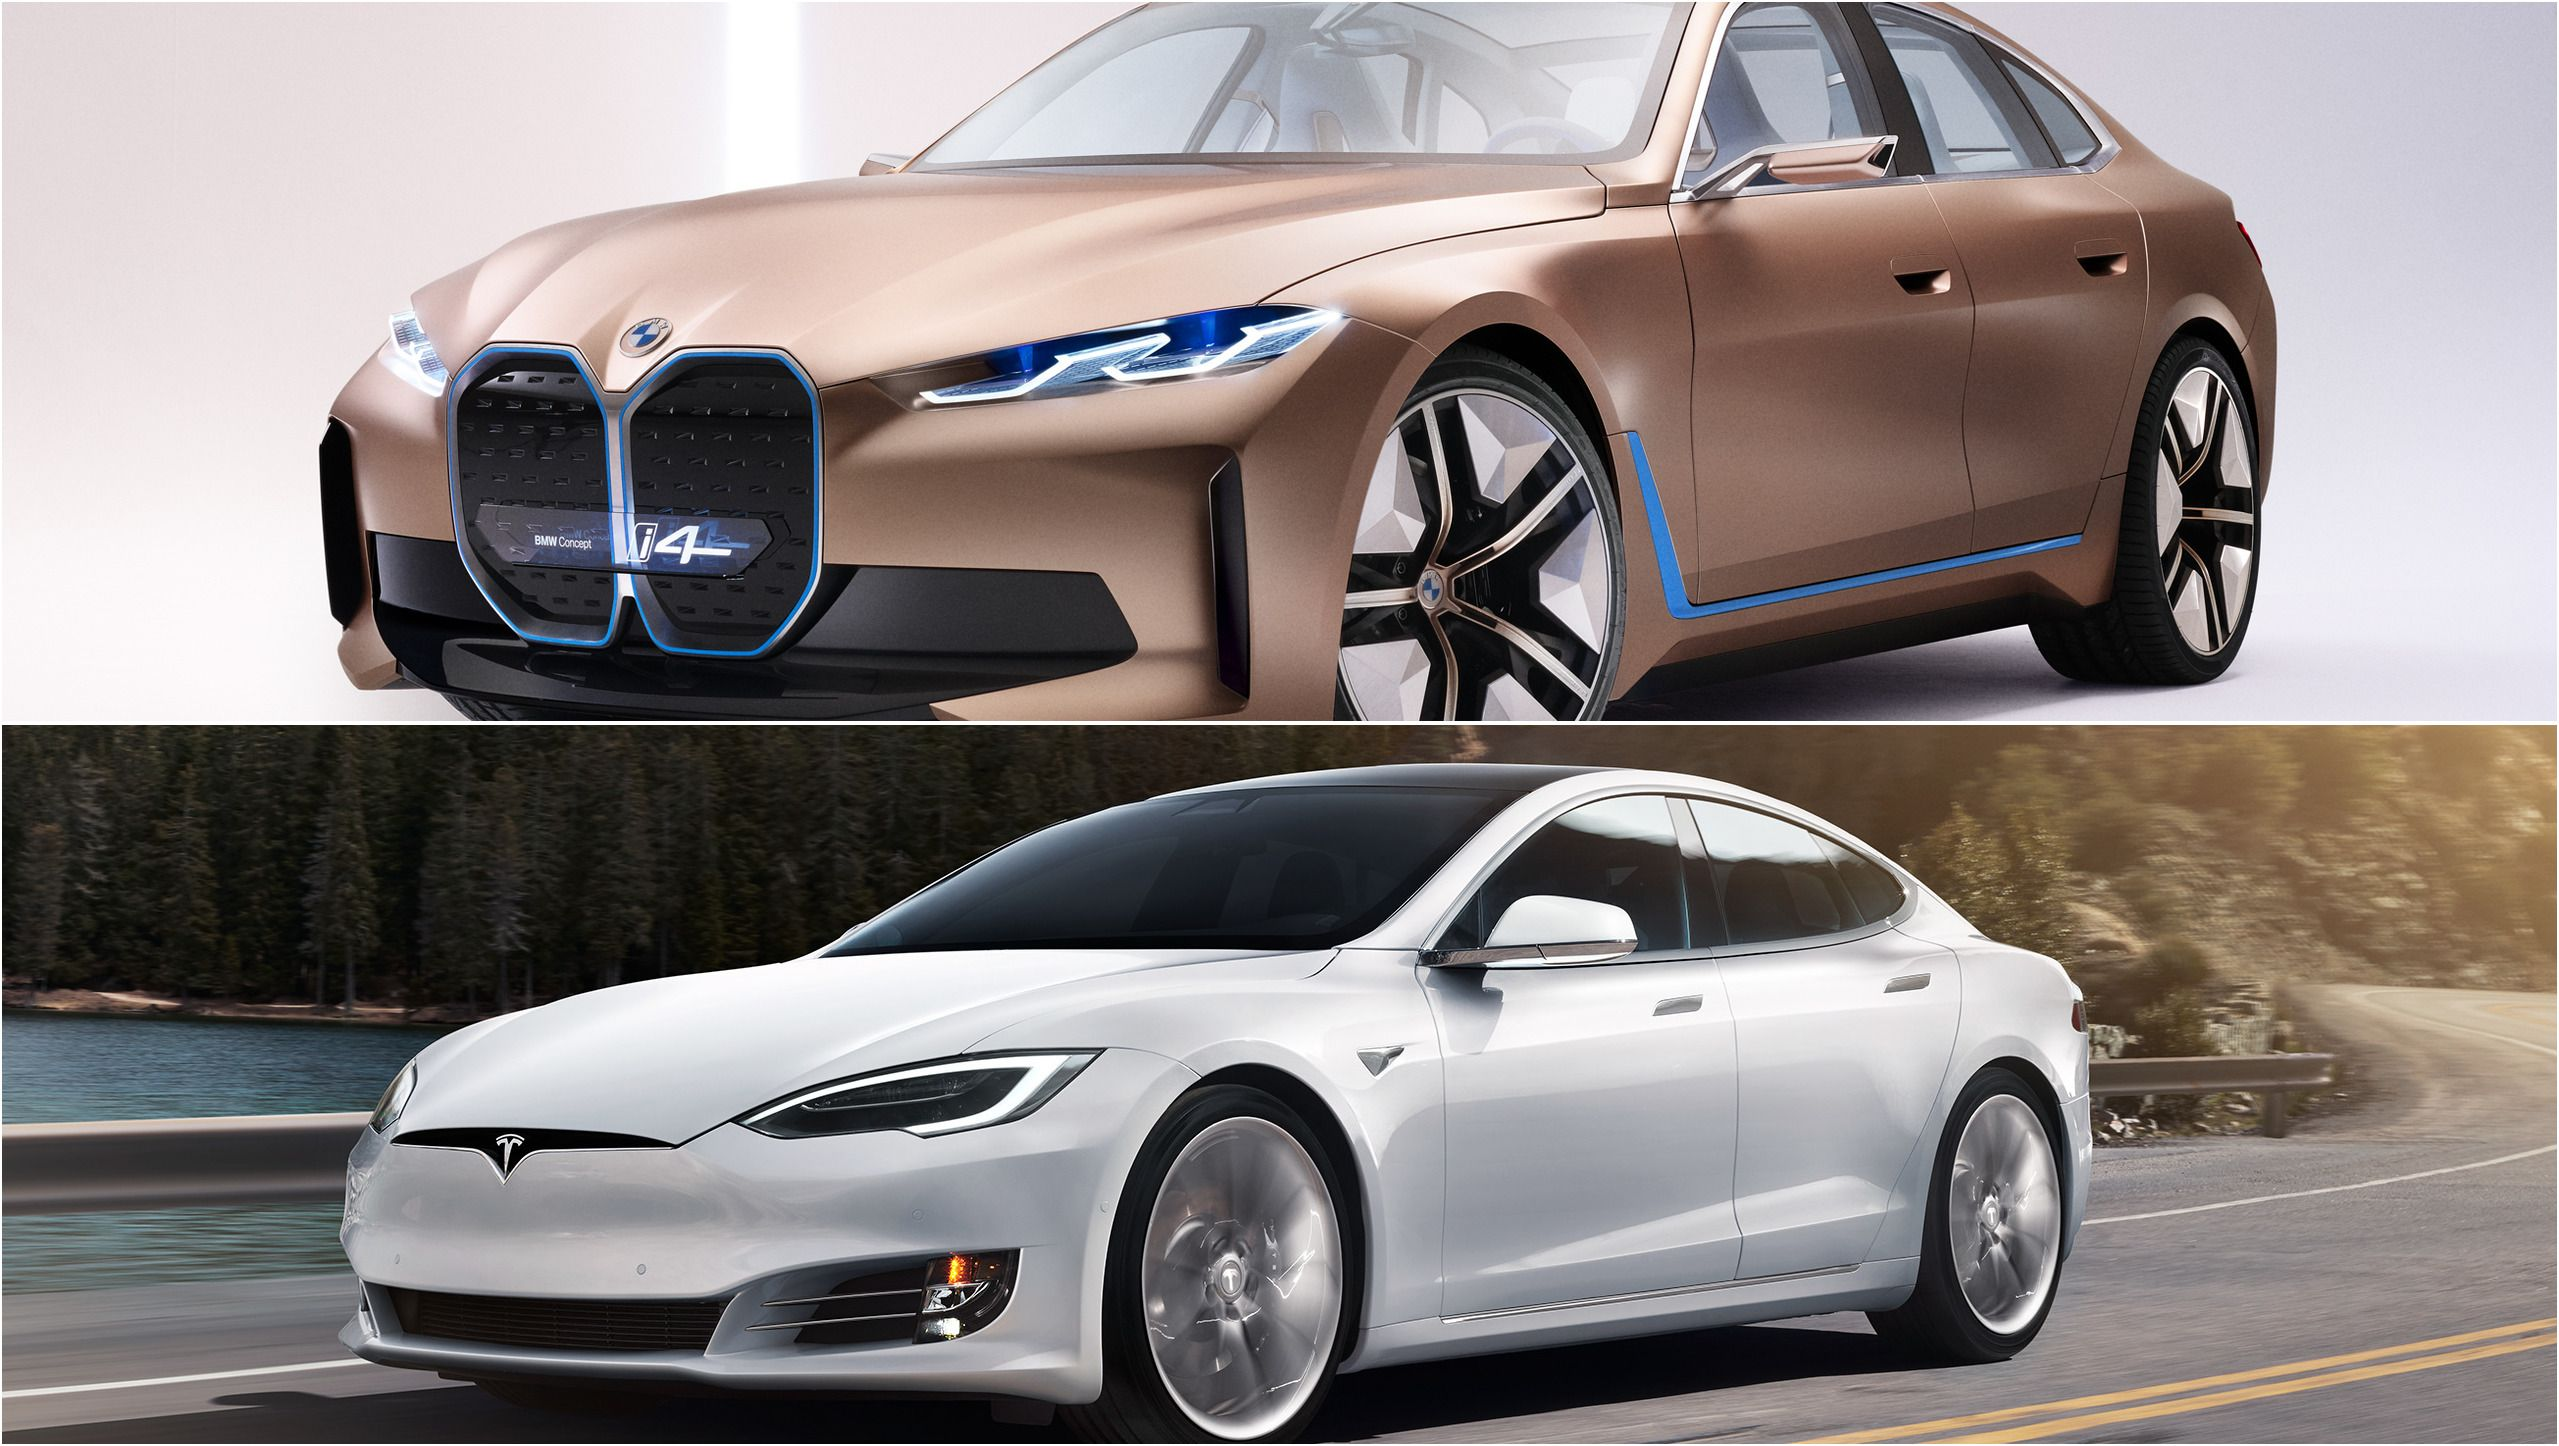 2021 Bmw I4 Vs 2020 Tesla Model S Top Speed In 2020 Tesla Model S Bmw Tesla Model